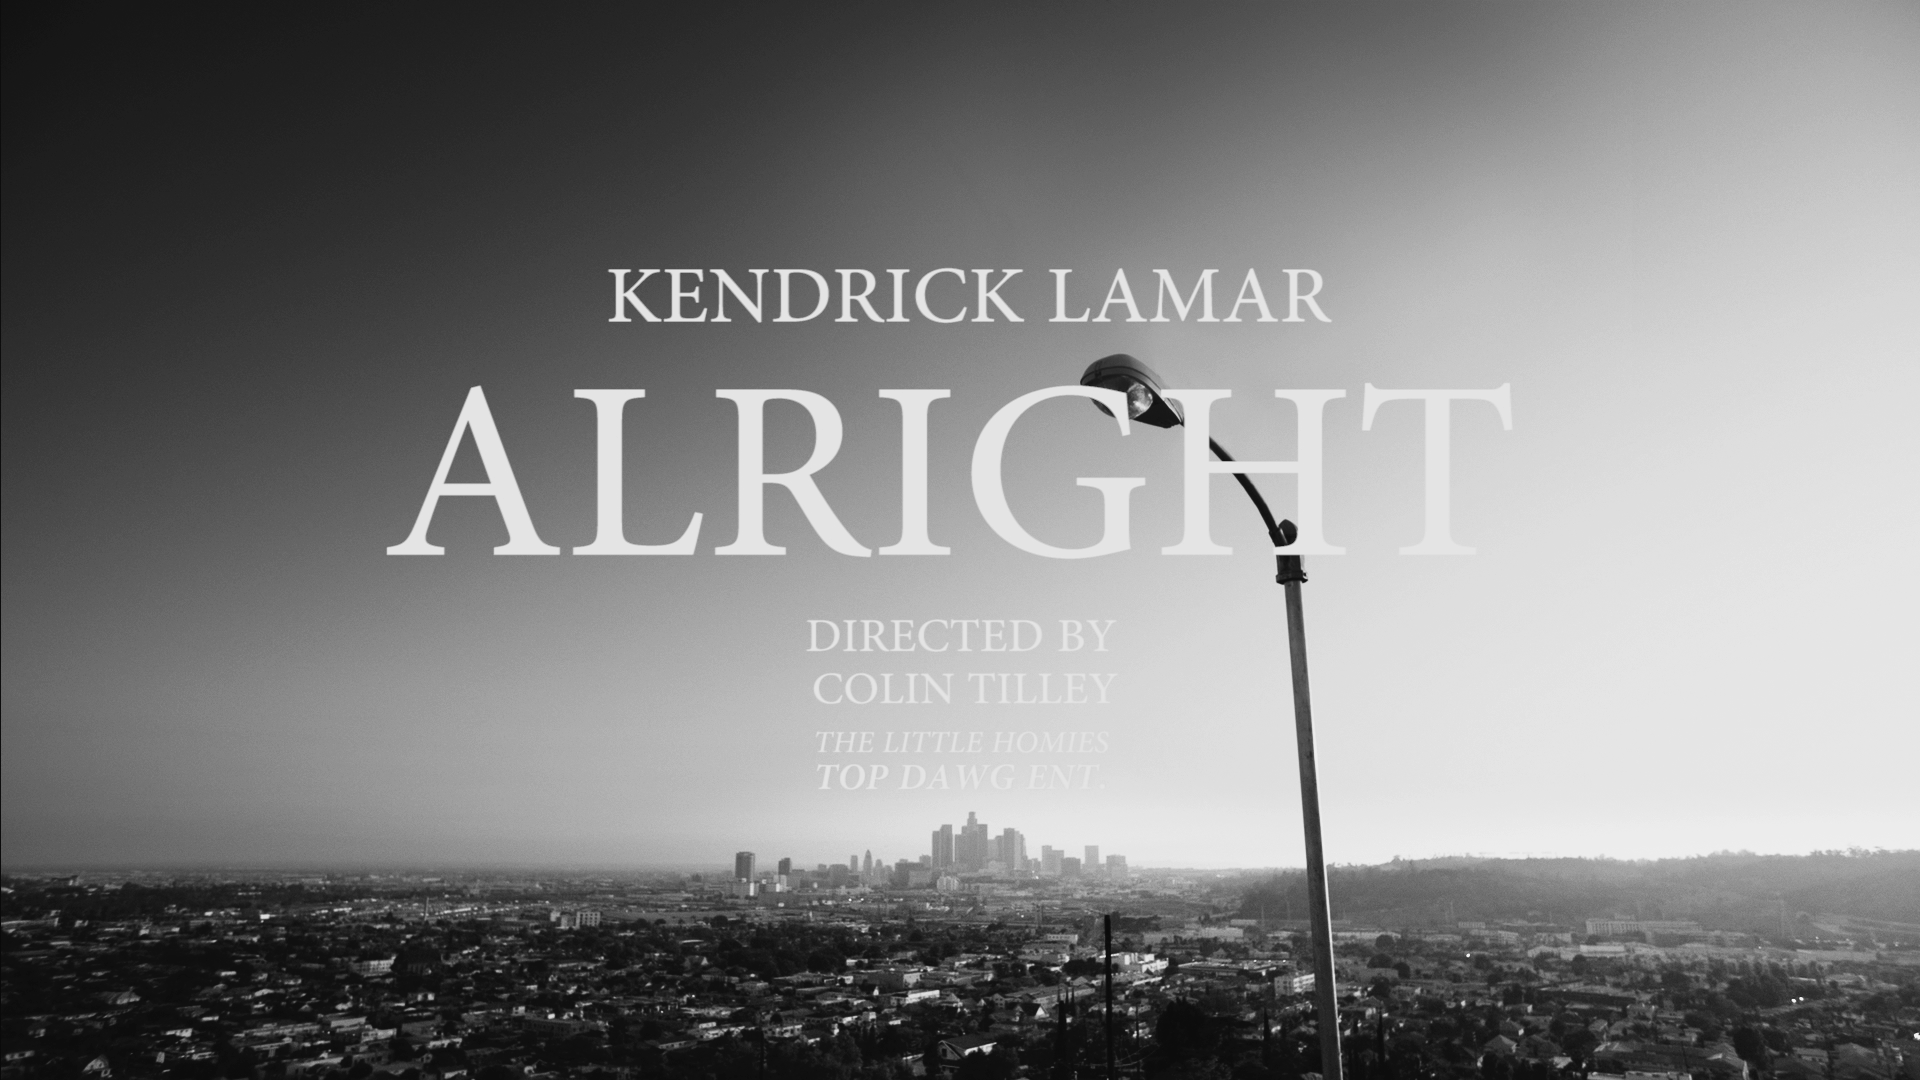 kl_alright_tde.png